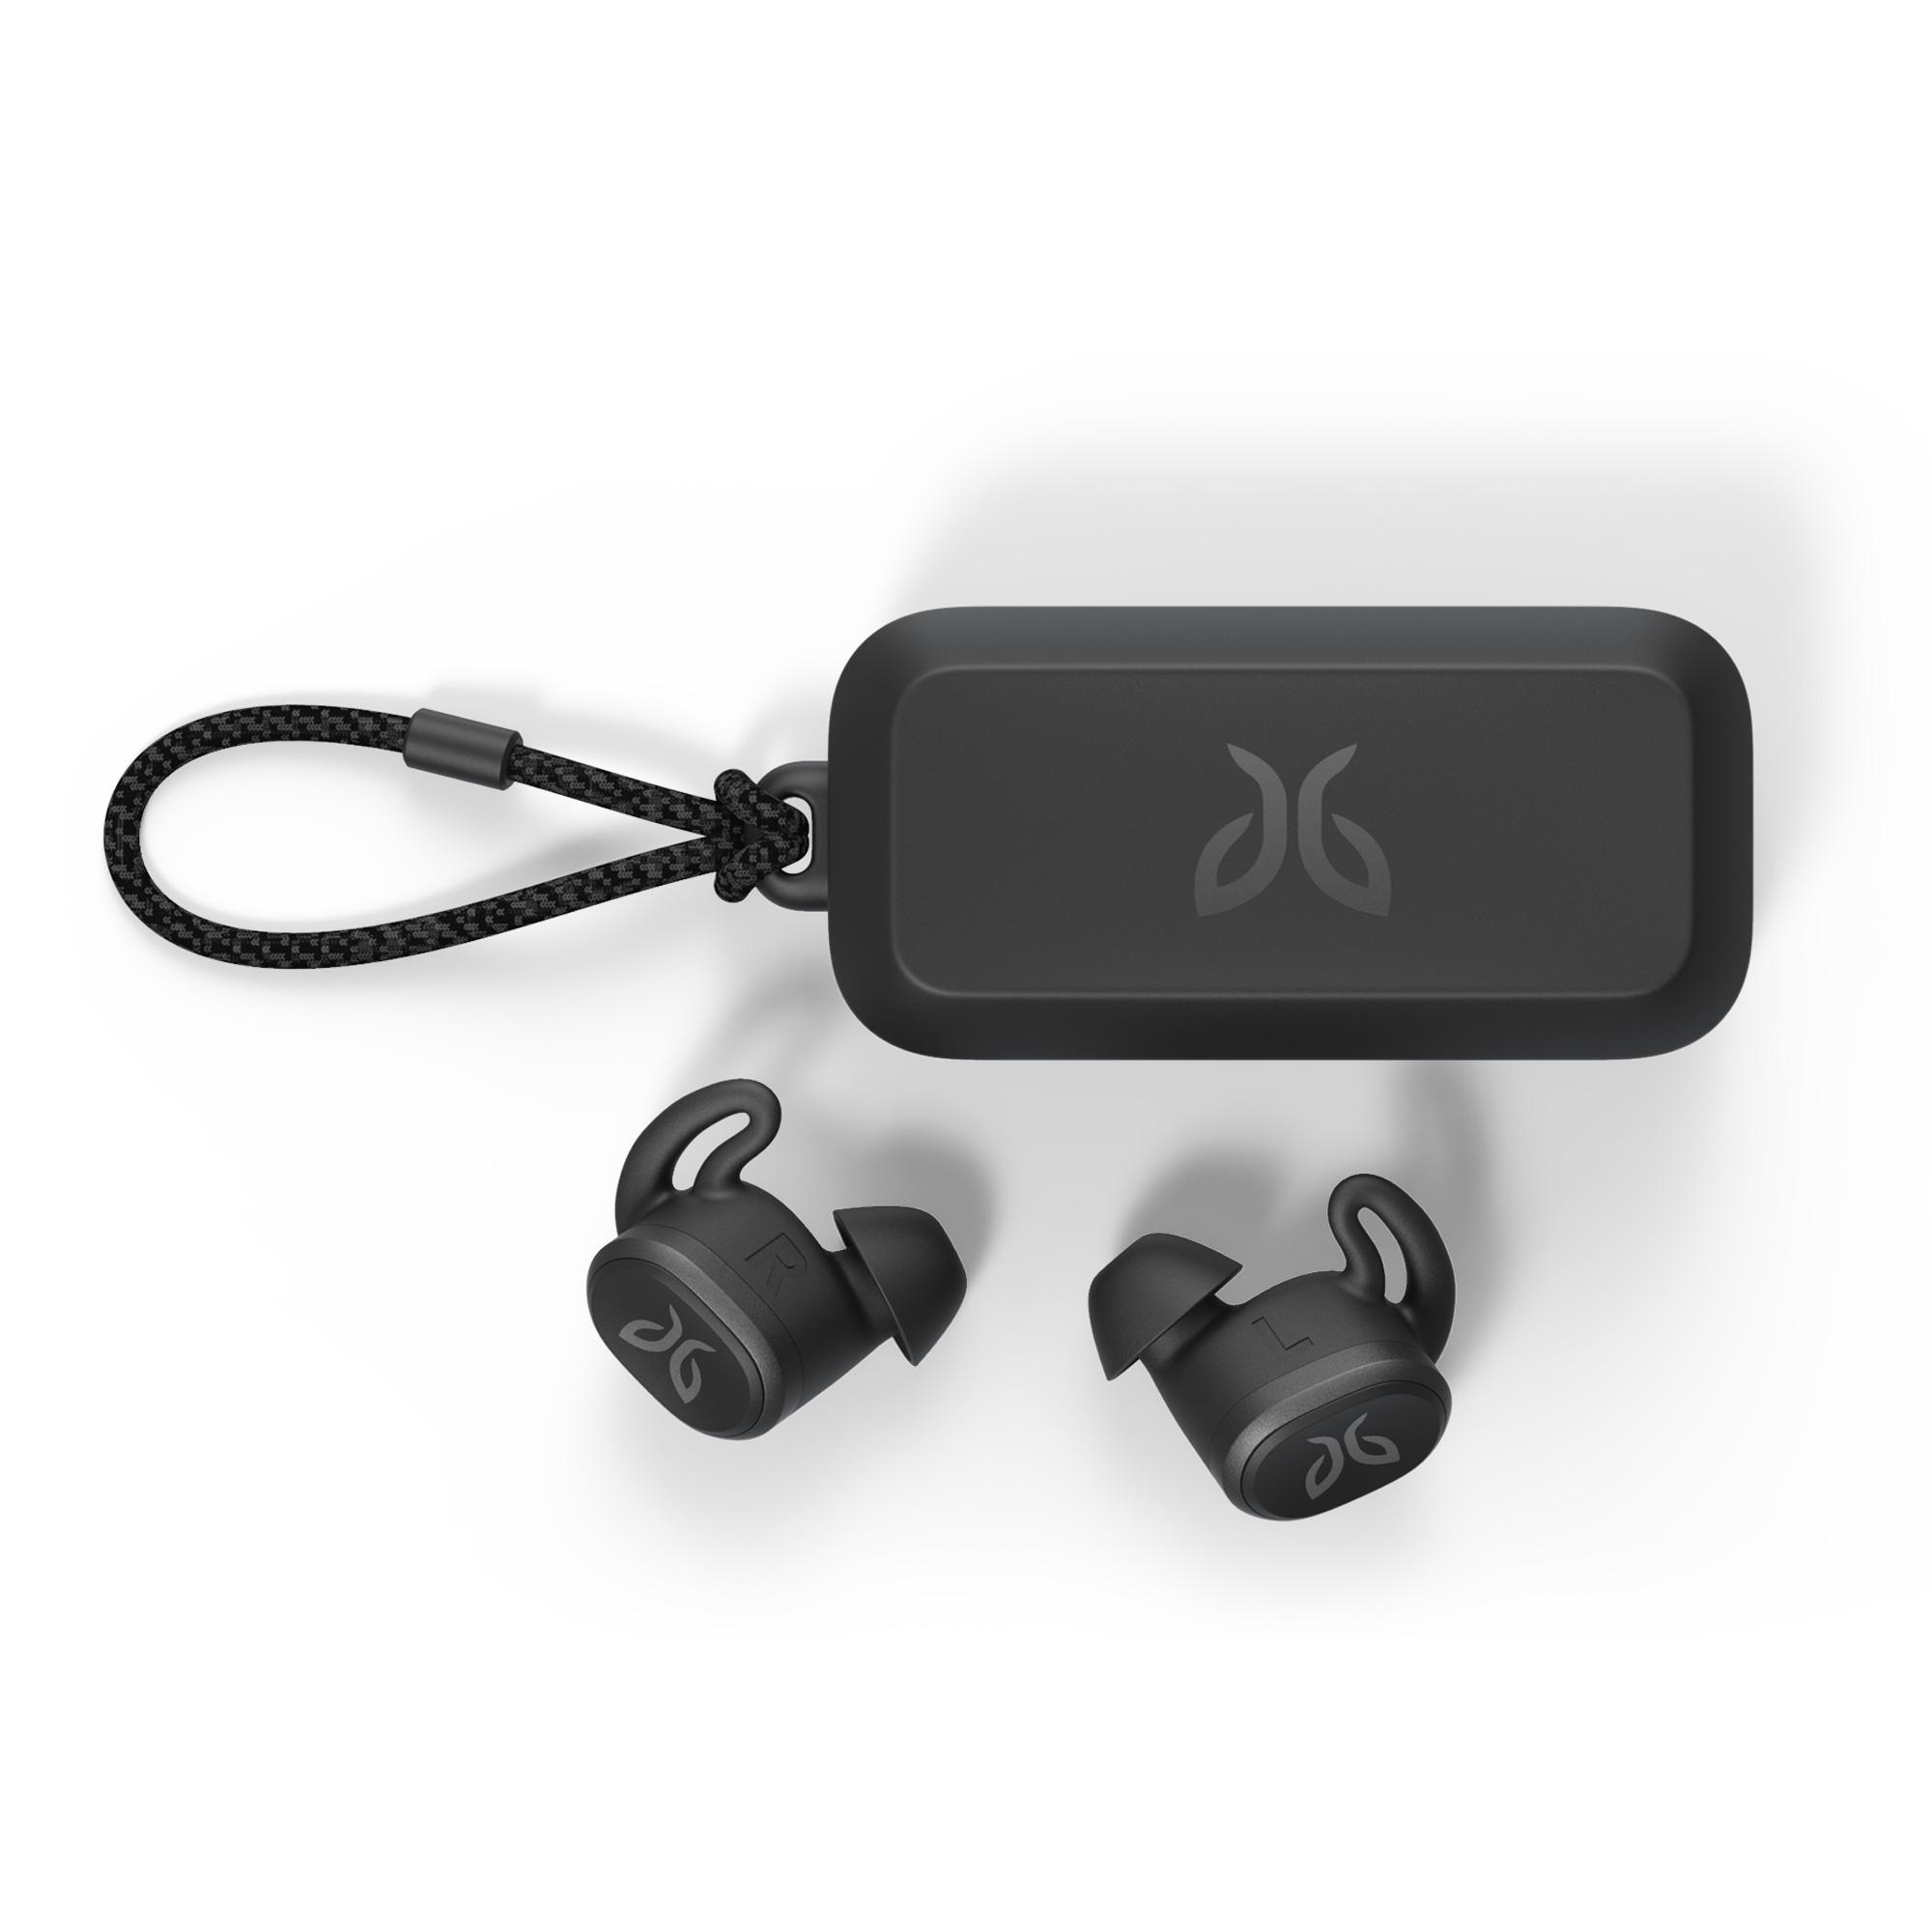 low priced 9188d e822e Jaybird Vista are waterproof wireless earbuds for runners | What Hi-Fi?